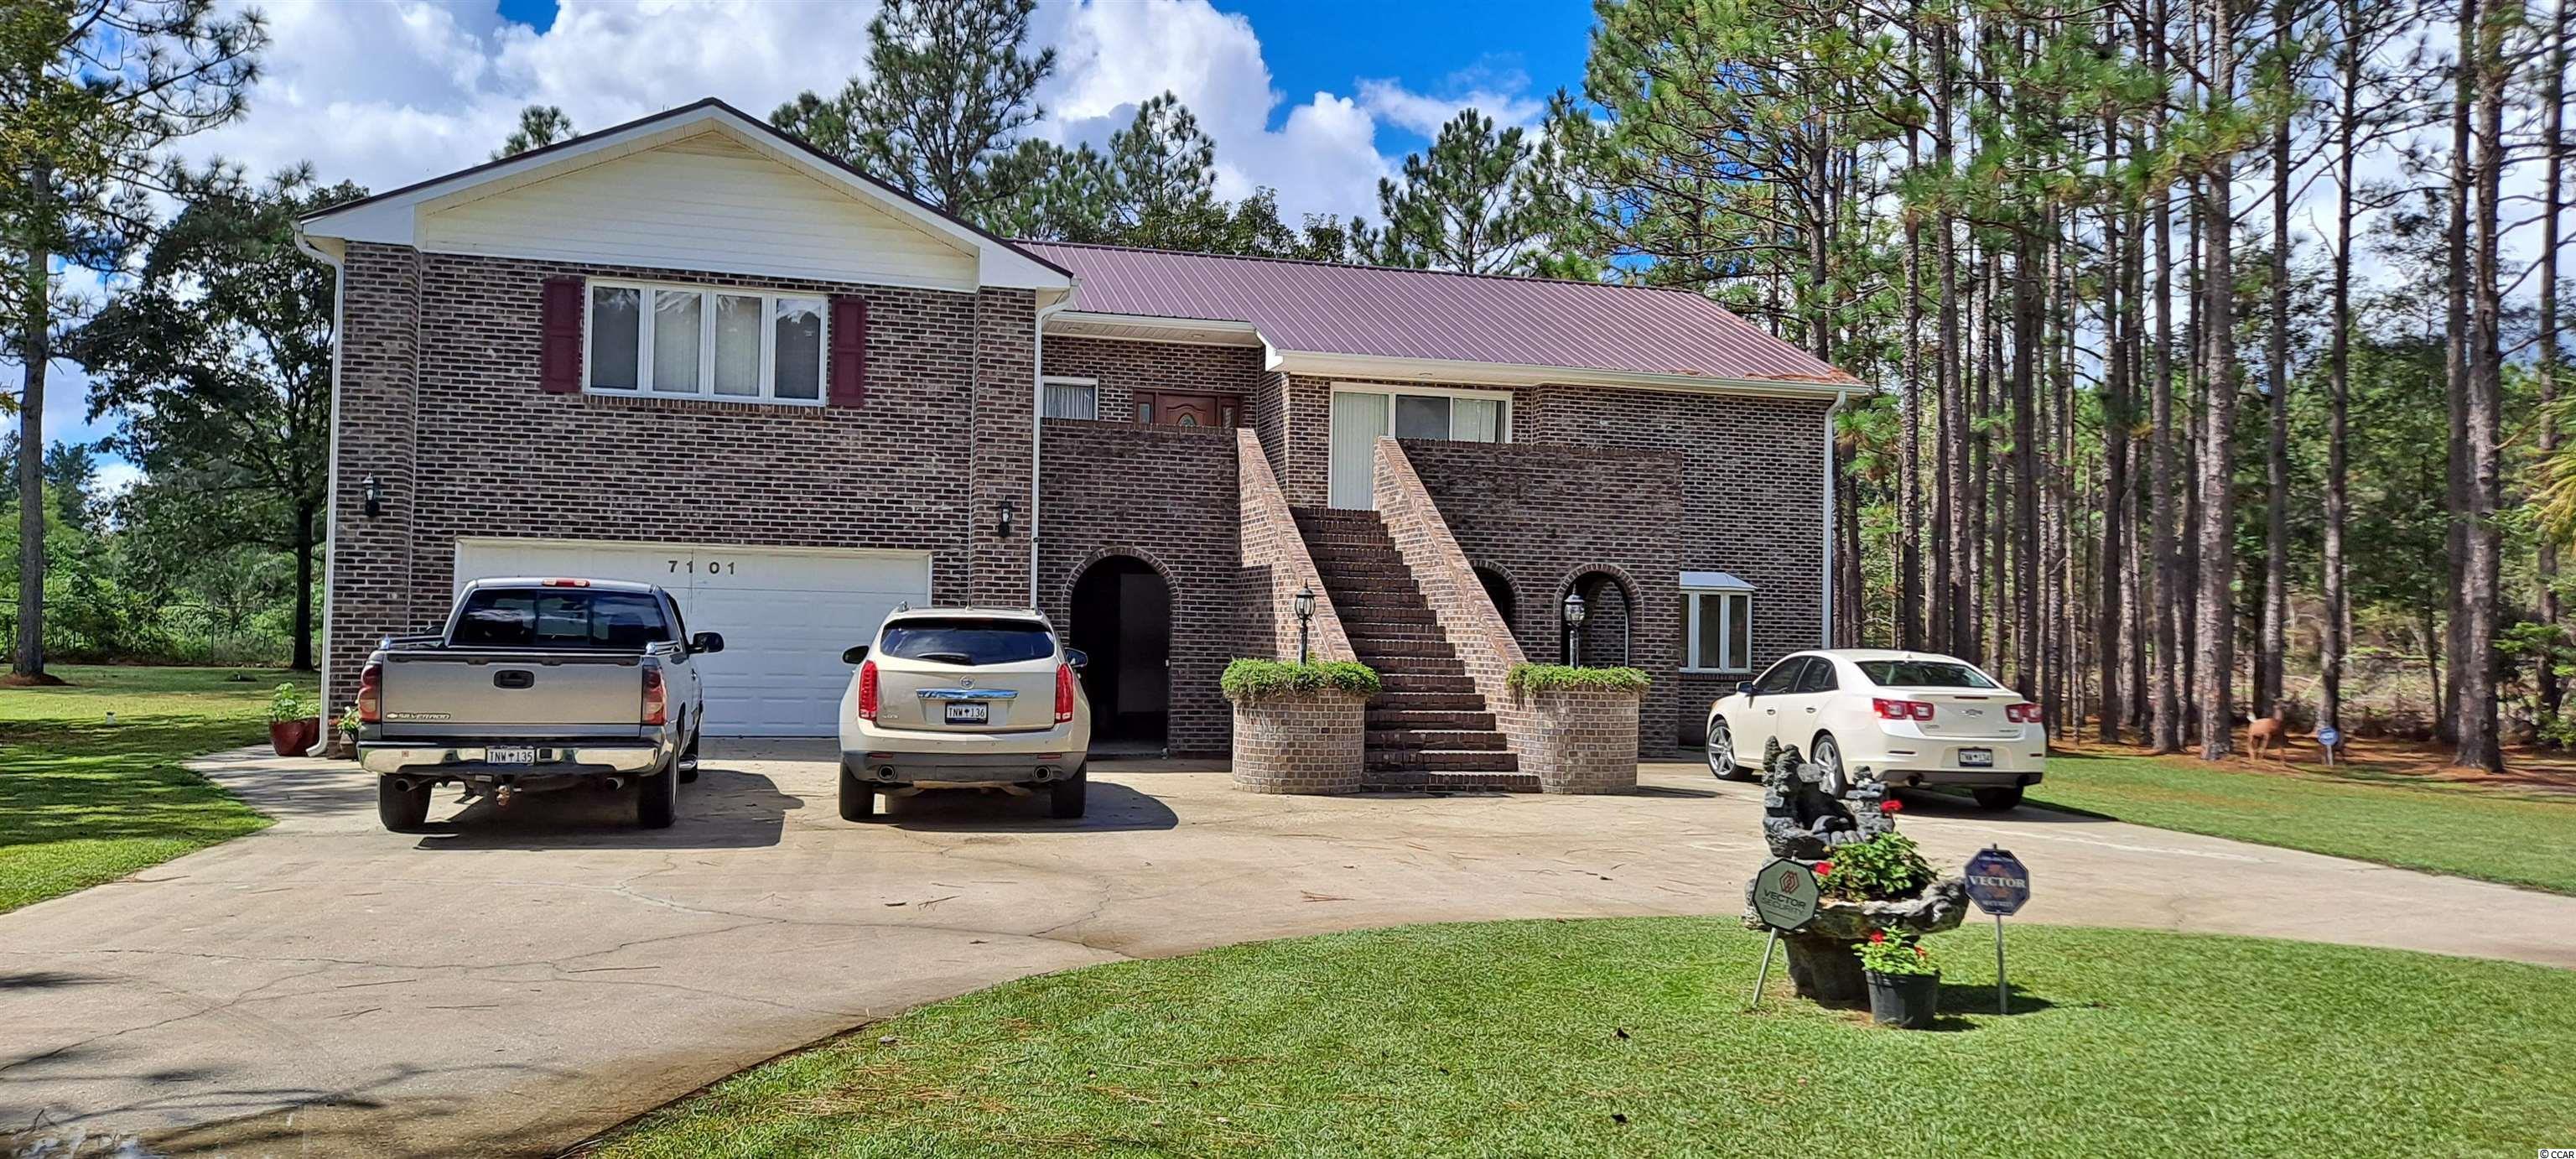 7101 Choppee Rd. Property Photo 1